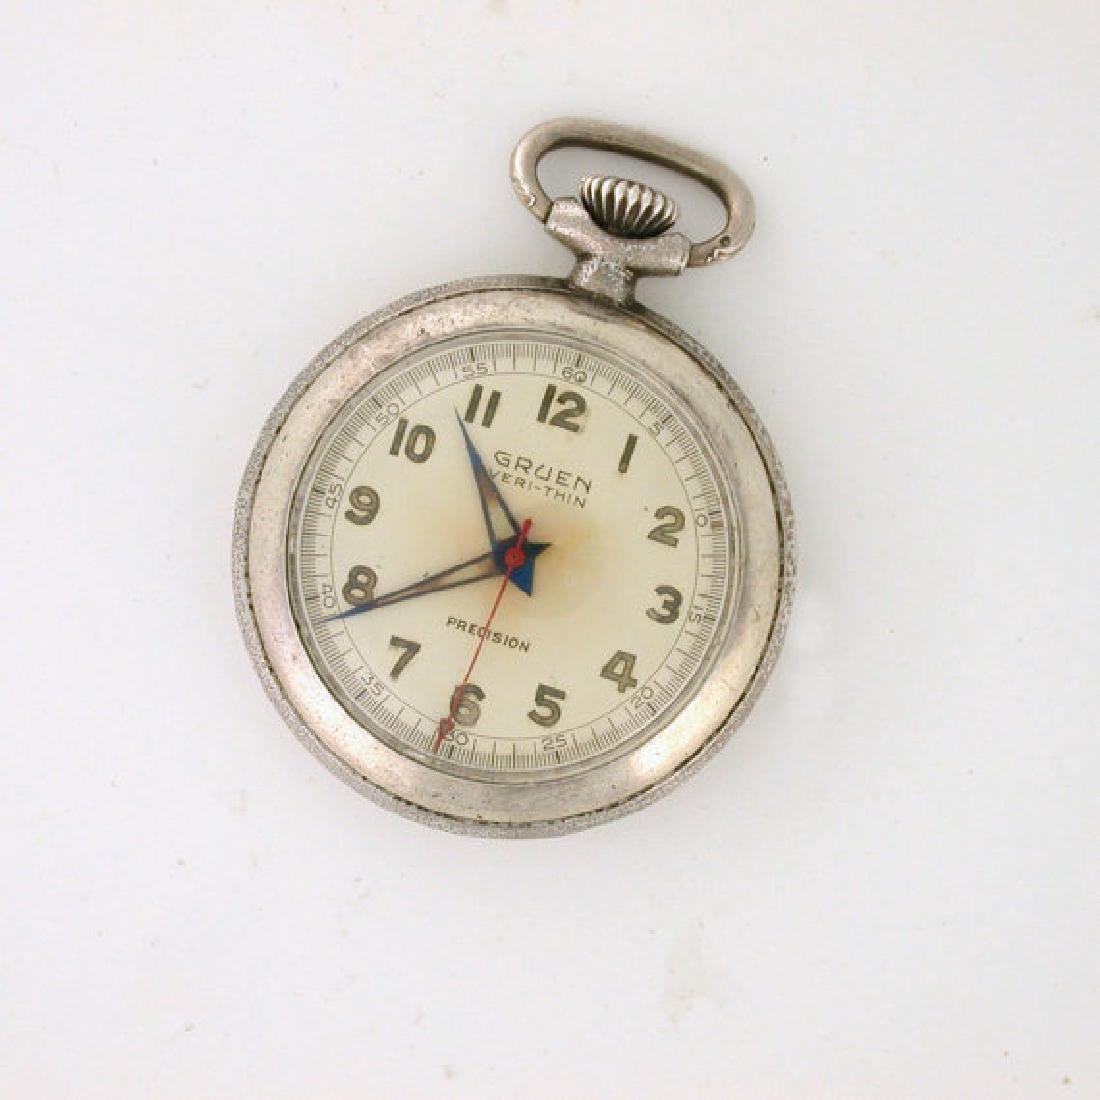 Gruen Precision Sterling Silver Rare Pocket Watch, 1951